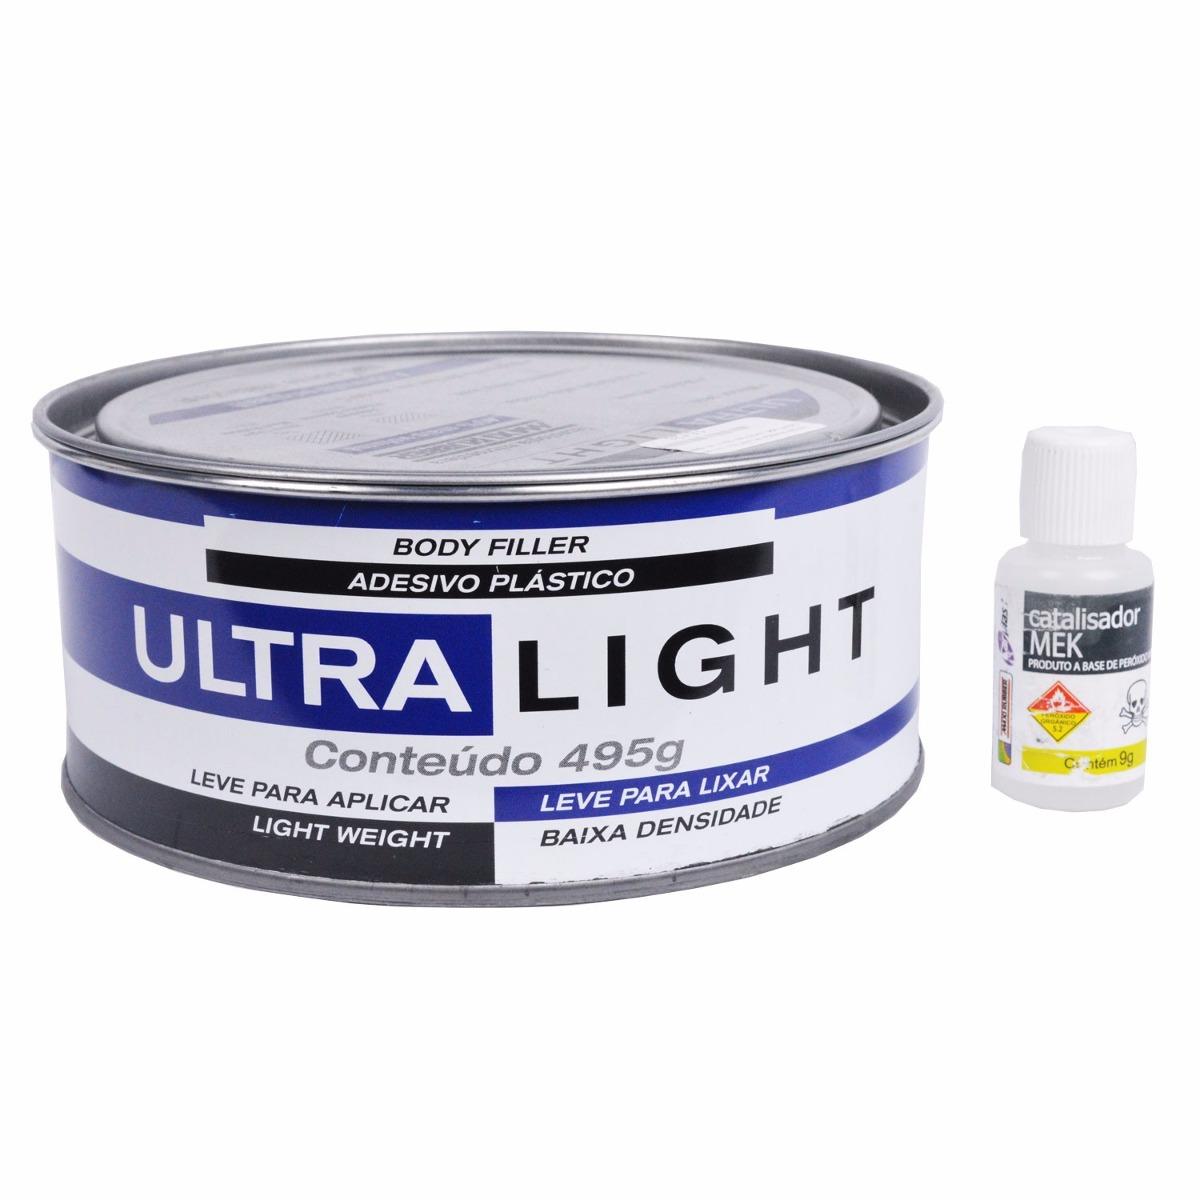 Armario Ferramentas Marcon ~ Massa Plastica Automotiva Adesivo Ultra Light Maxi Rubber R$ 10,50 em Mercado Livre